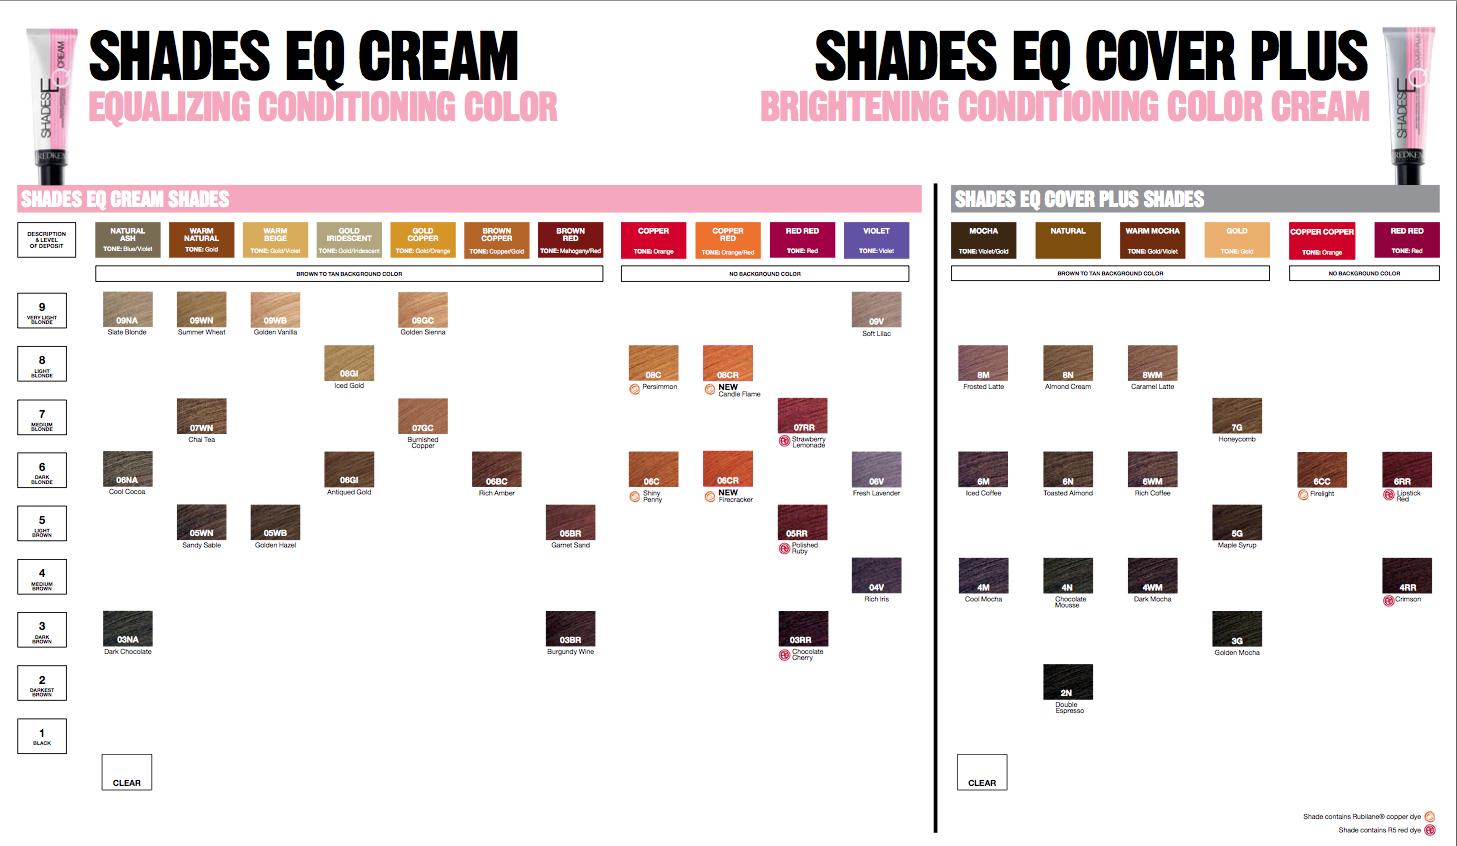 Redken Shades Eq Cover Plus Color Chart Redken Hair Color Hair Color Chart Redken Hair Color Chart